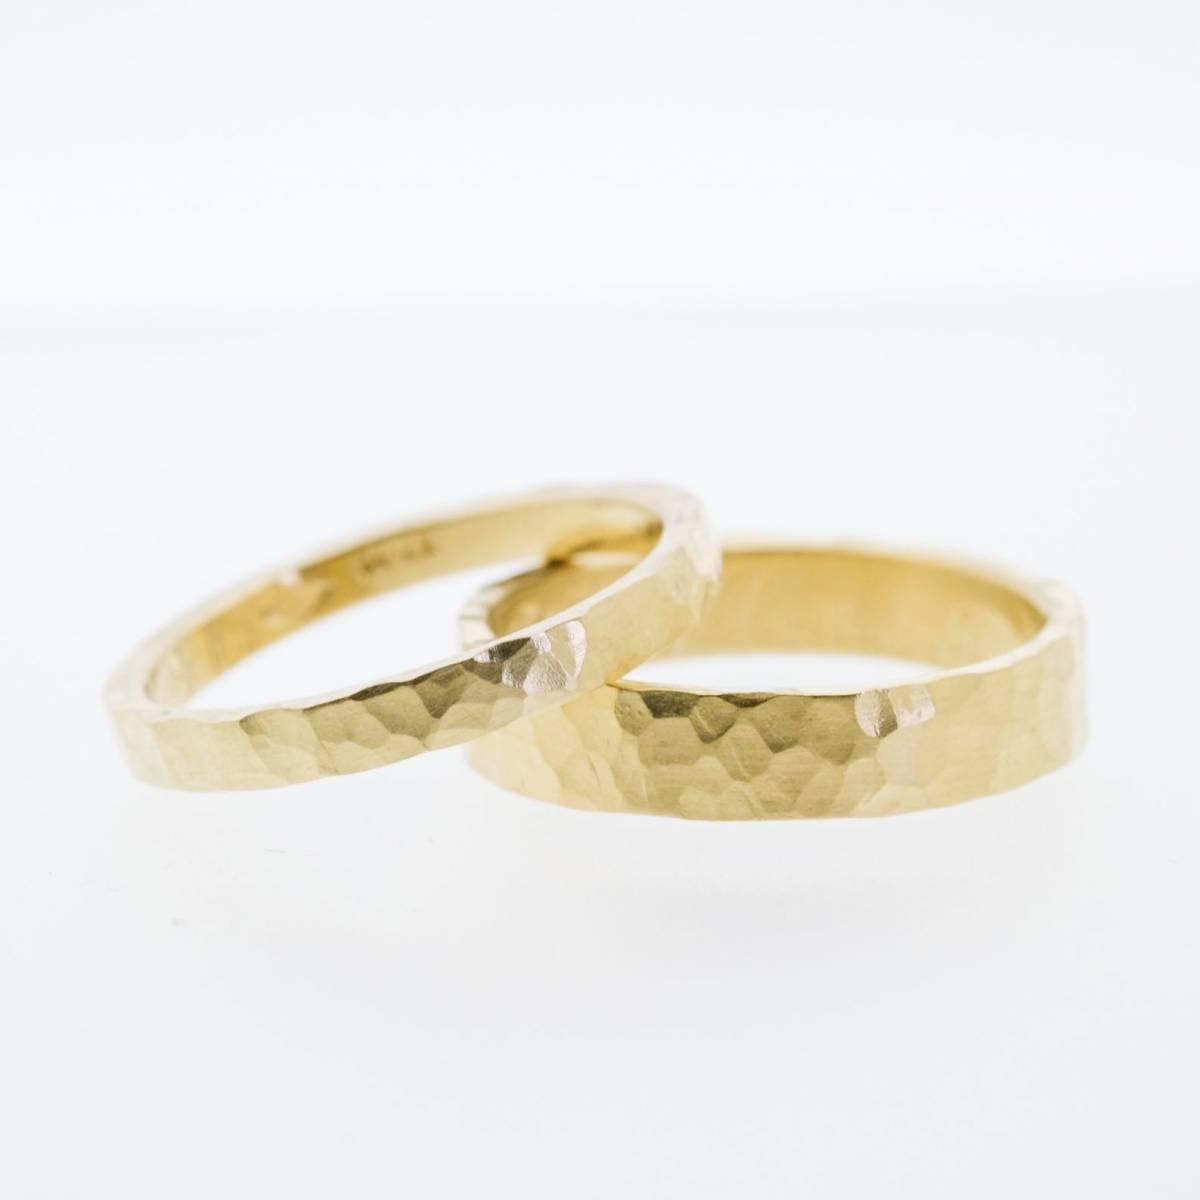 Jonas Maes Jewels - Juwelen - Bruidsjuwelen - Verlovingsring - Trouwring - House of Weddings - 2